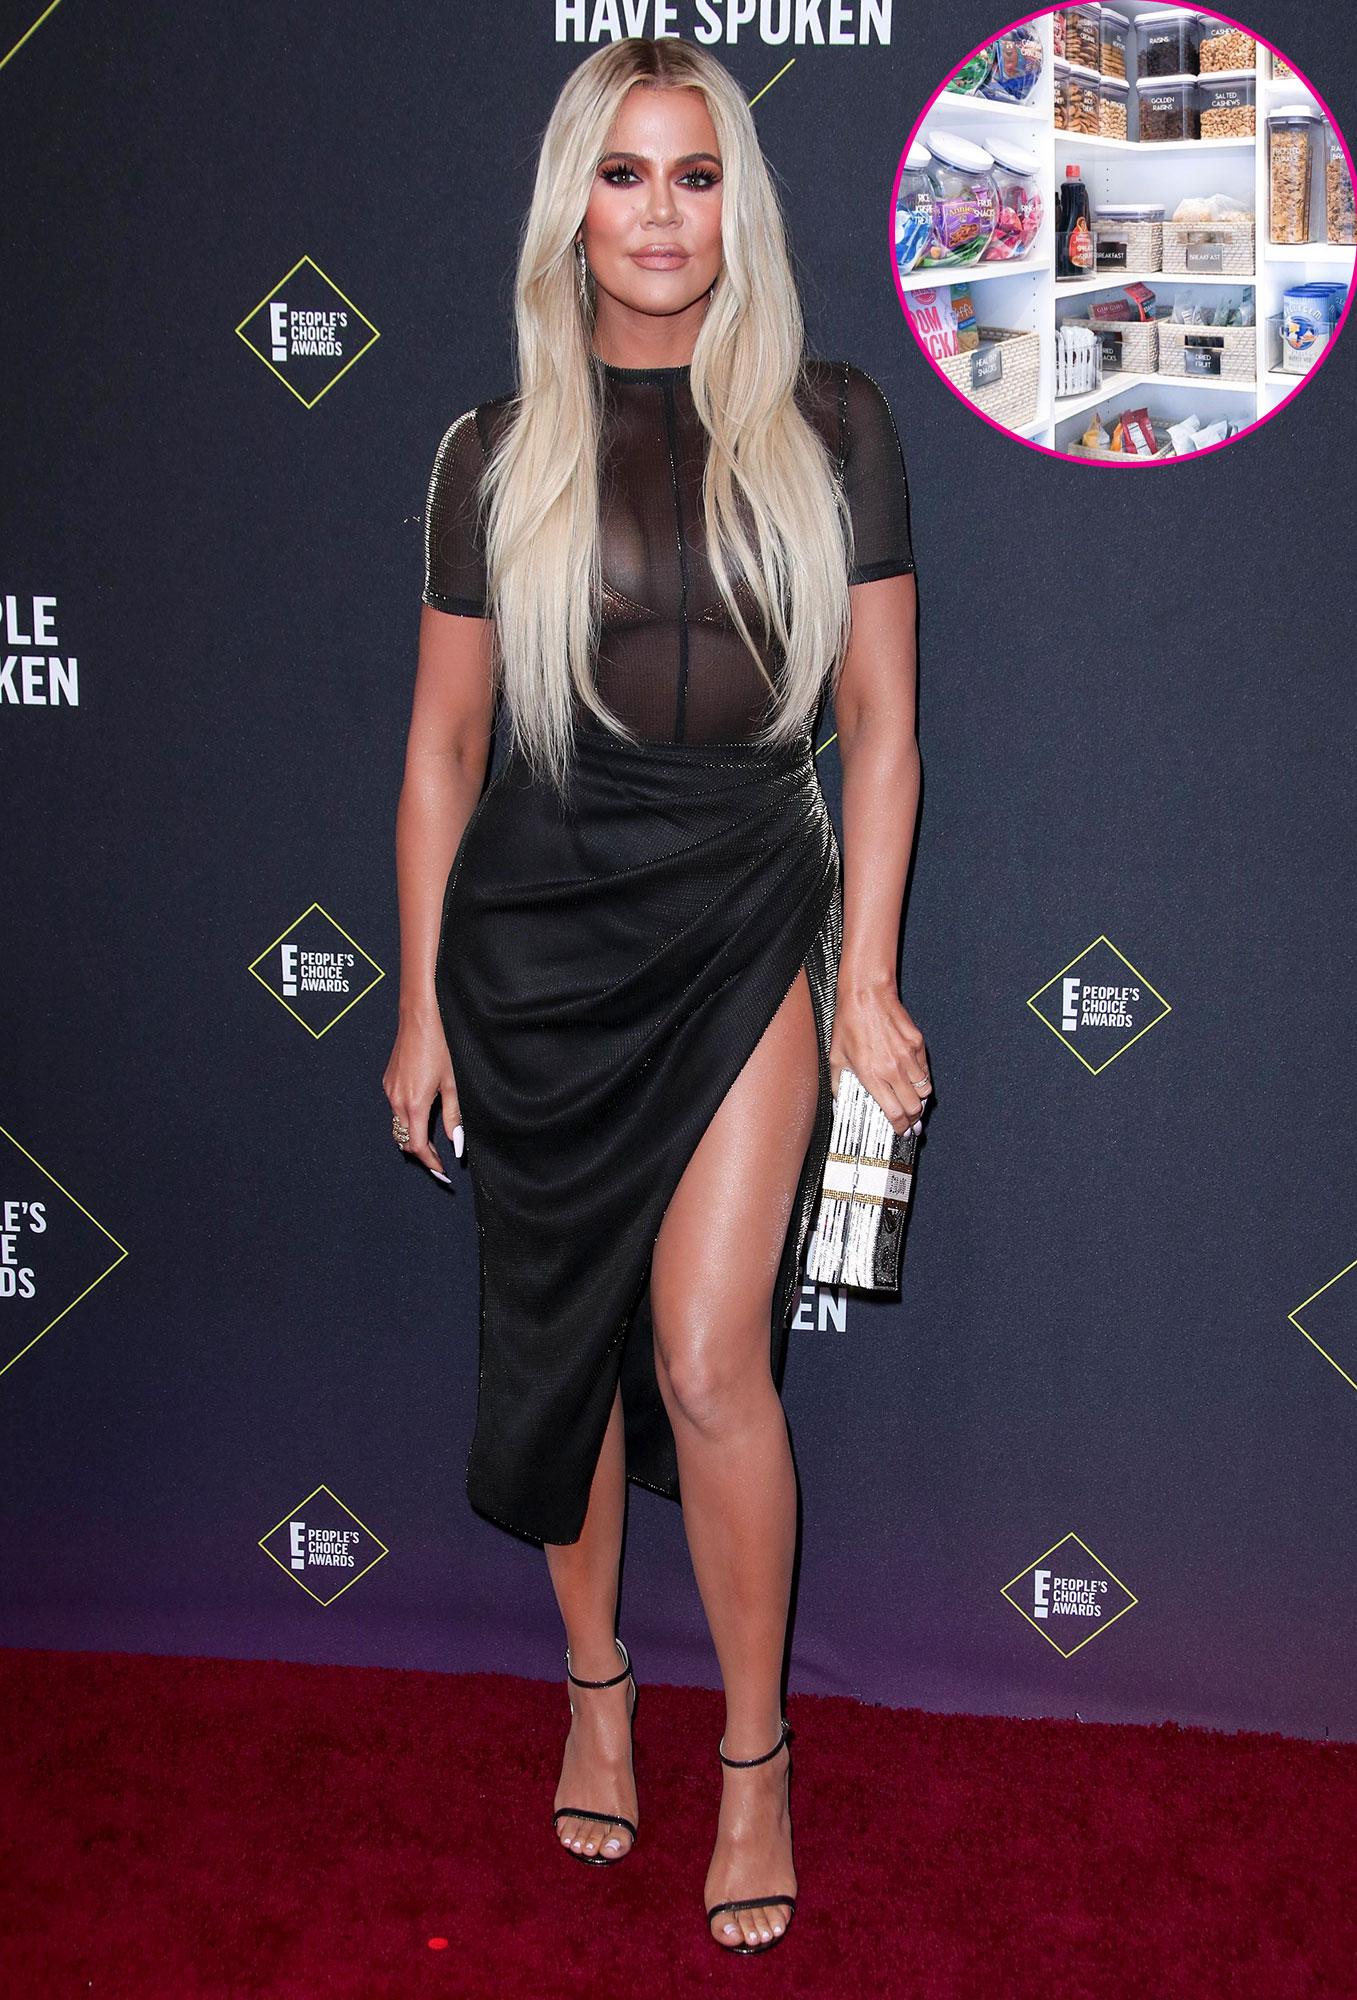 Khloe Kardashian Shows Off Organized Pantry Calls It Her Happy